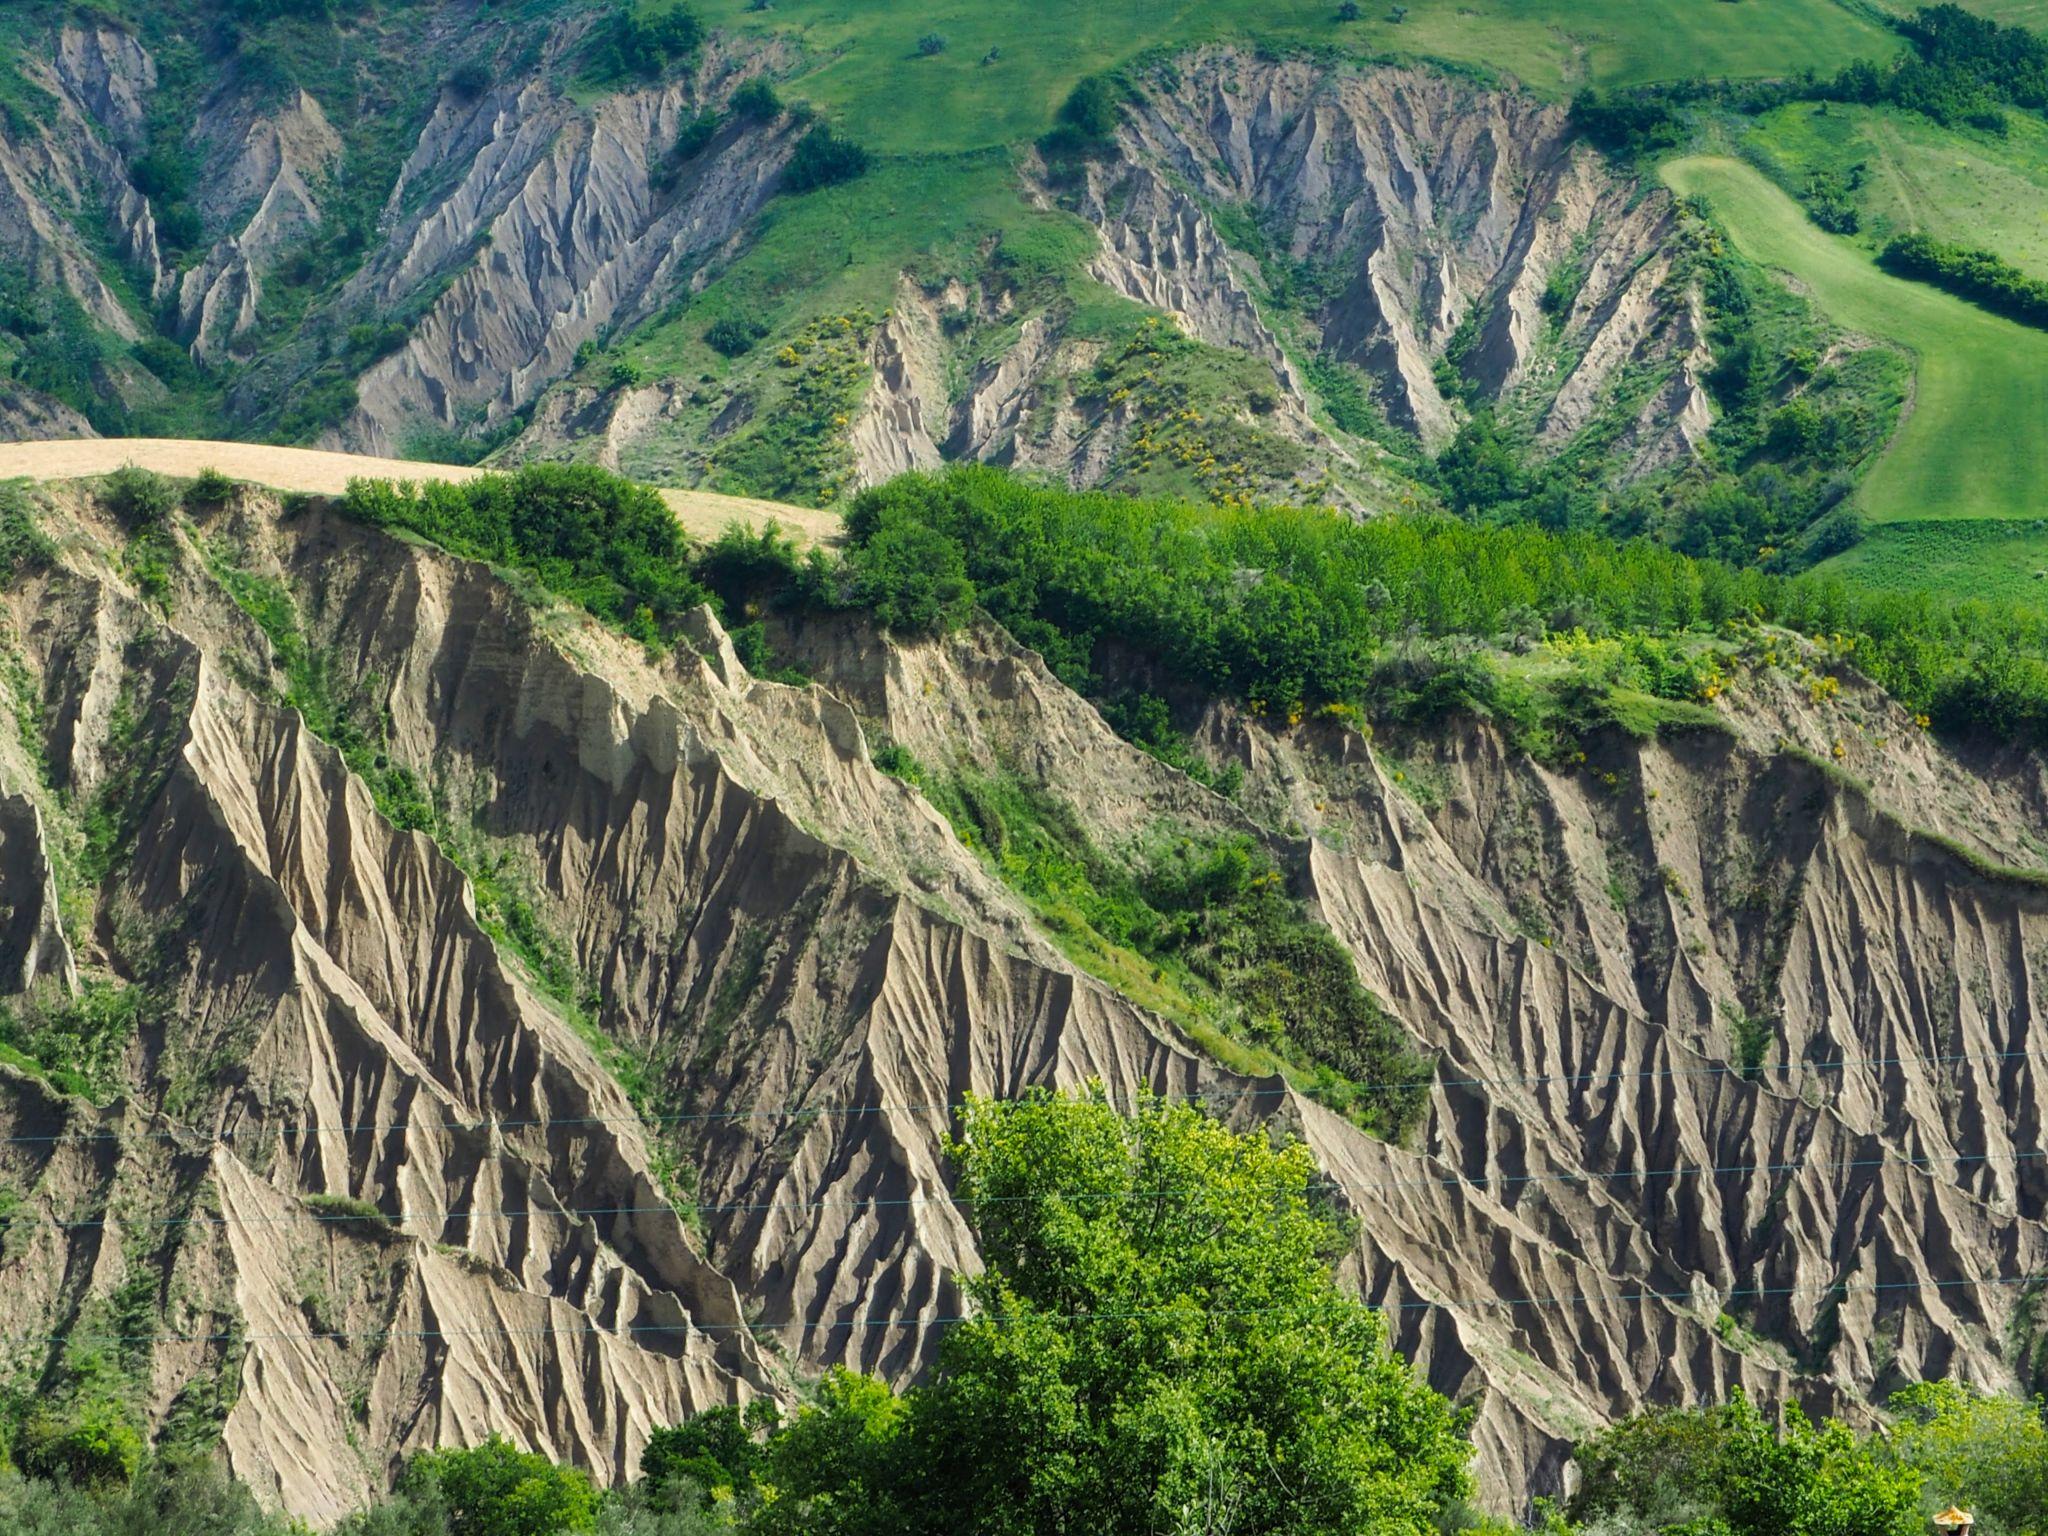 The Valleys of Atri, Italy